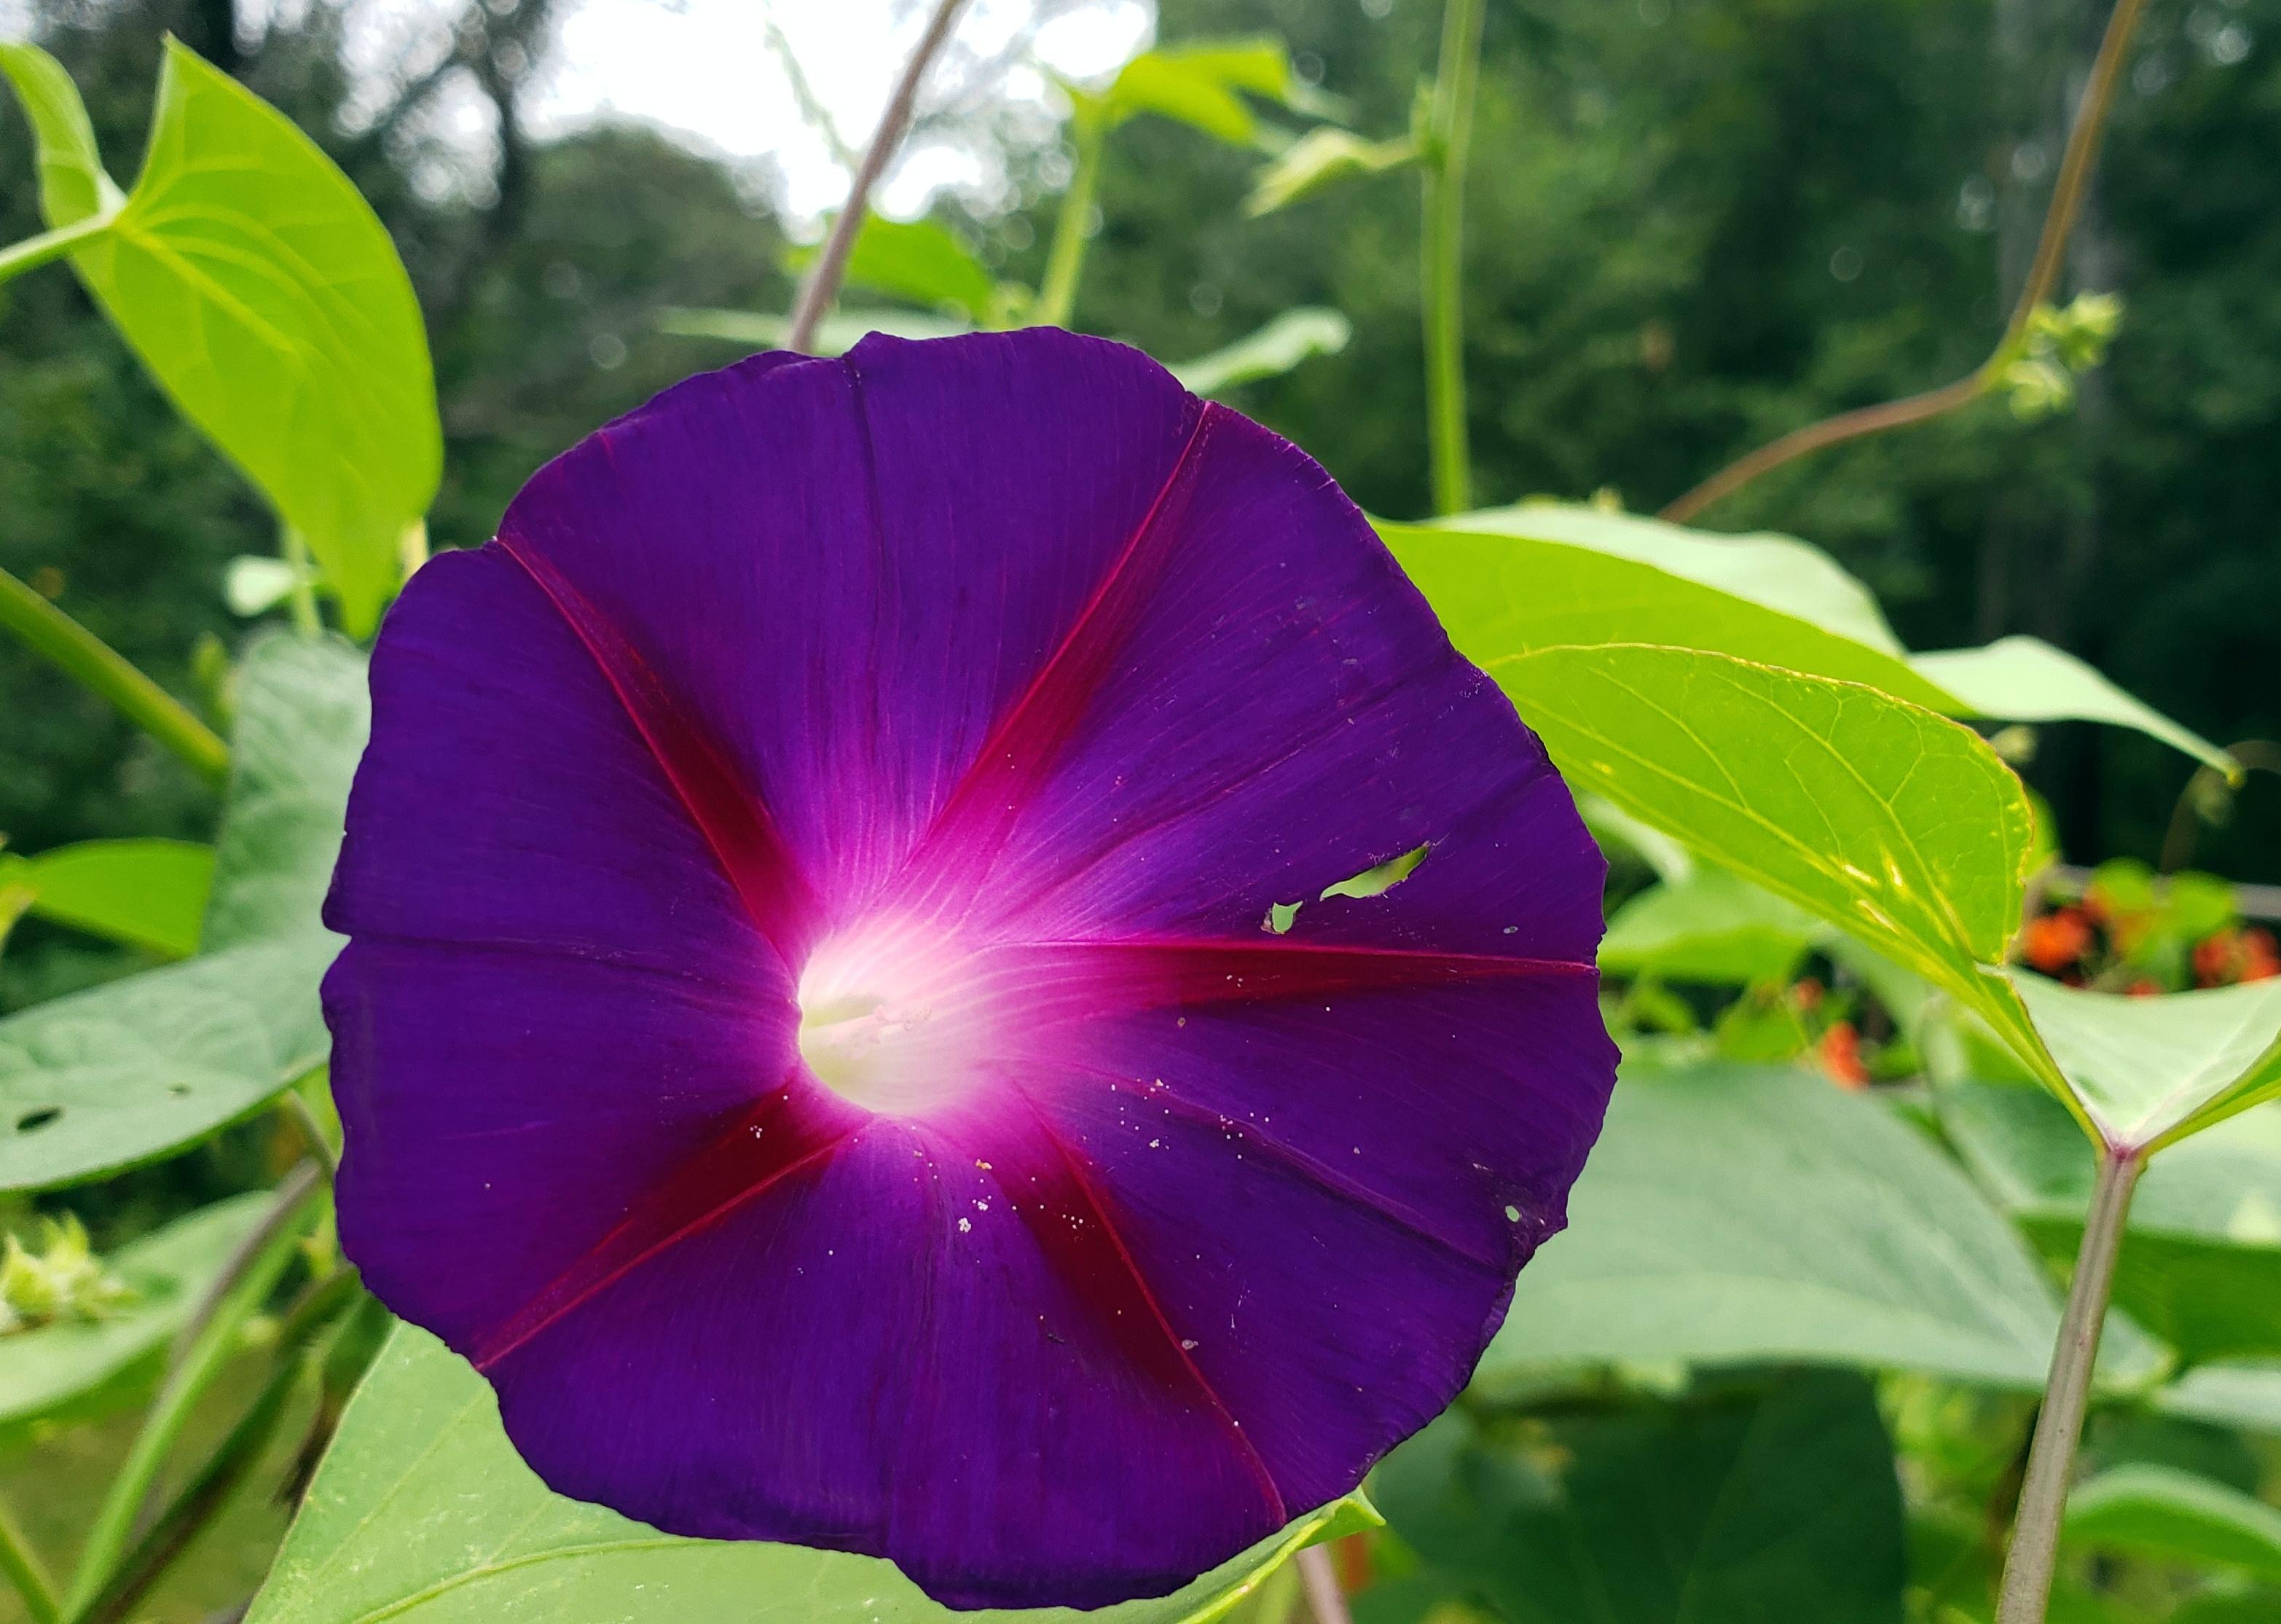 purpleredmorninggloryflower16Aug2020